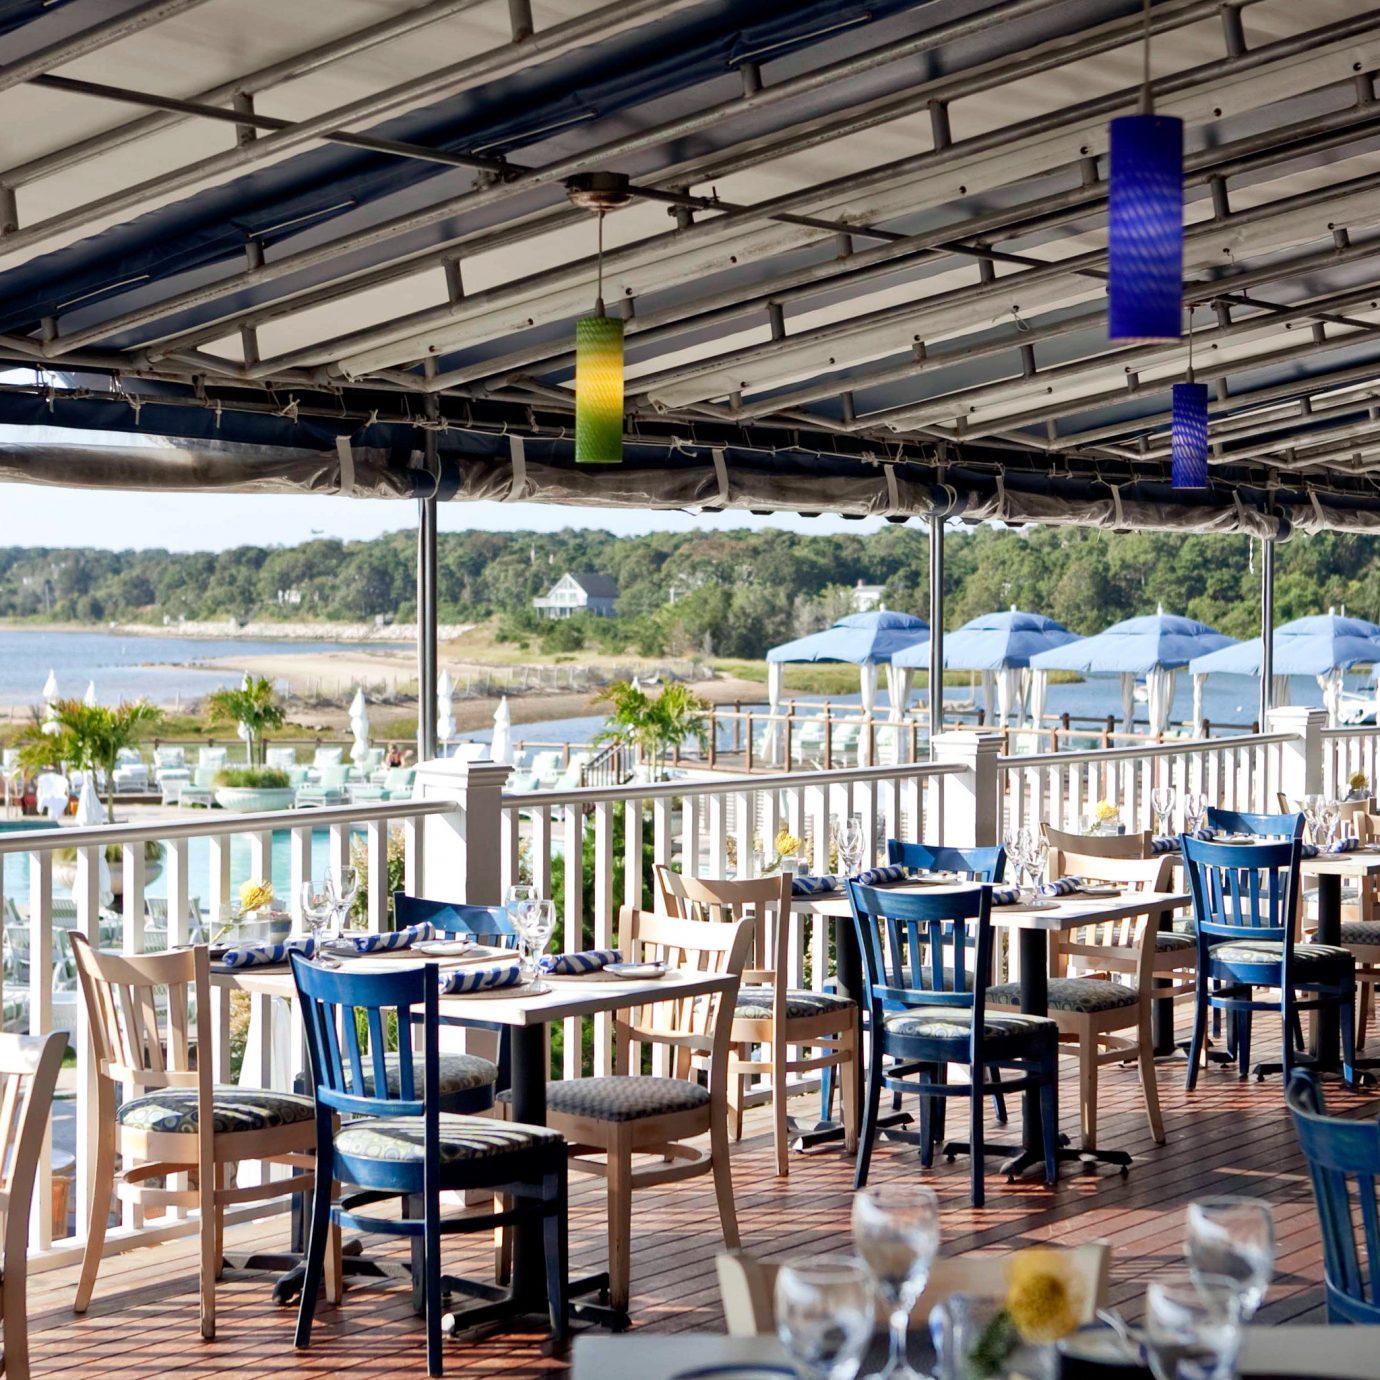 Balcony Deck Dining Drink Eat Food + Drink Hotels Lounge Luxury Travel Patio Resort Terrace Travel Deals Trip Ideas Weekend Getaways chair restaurant